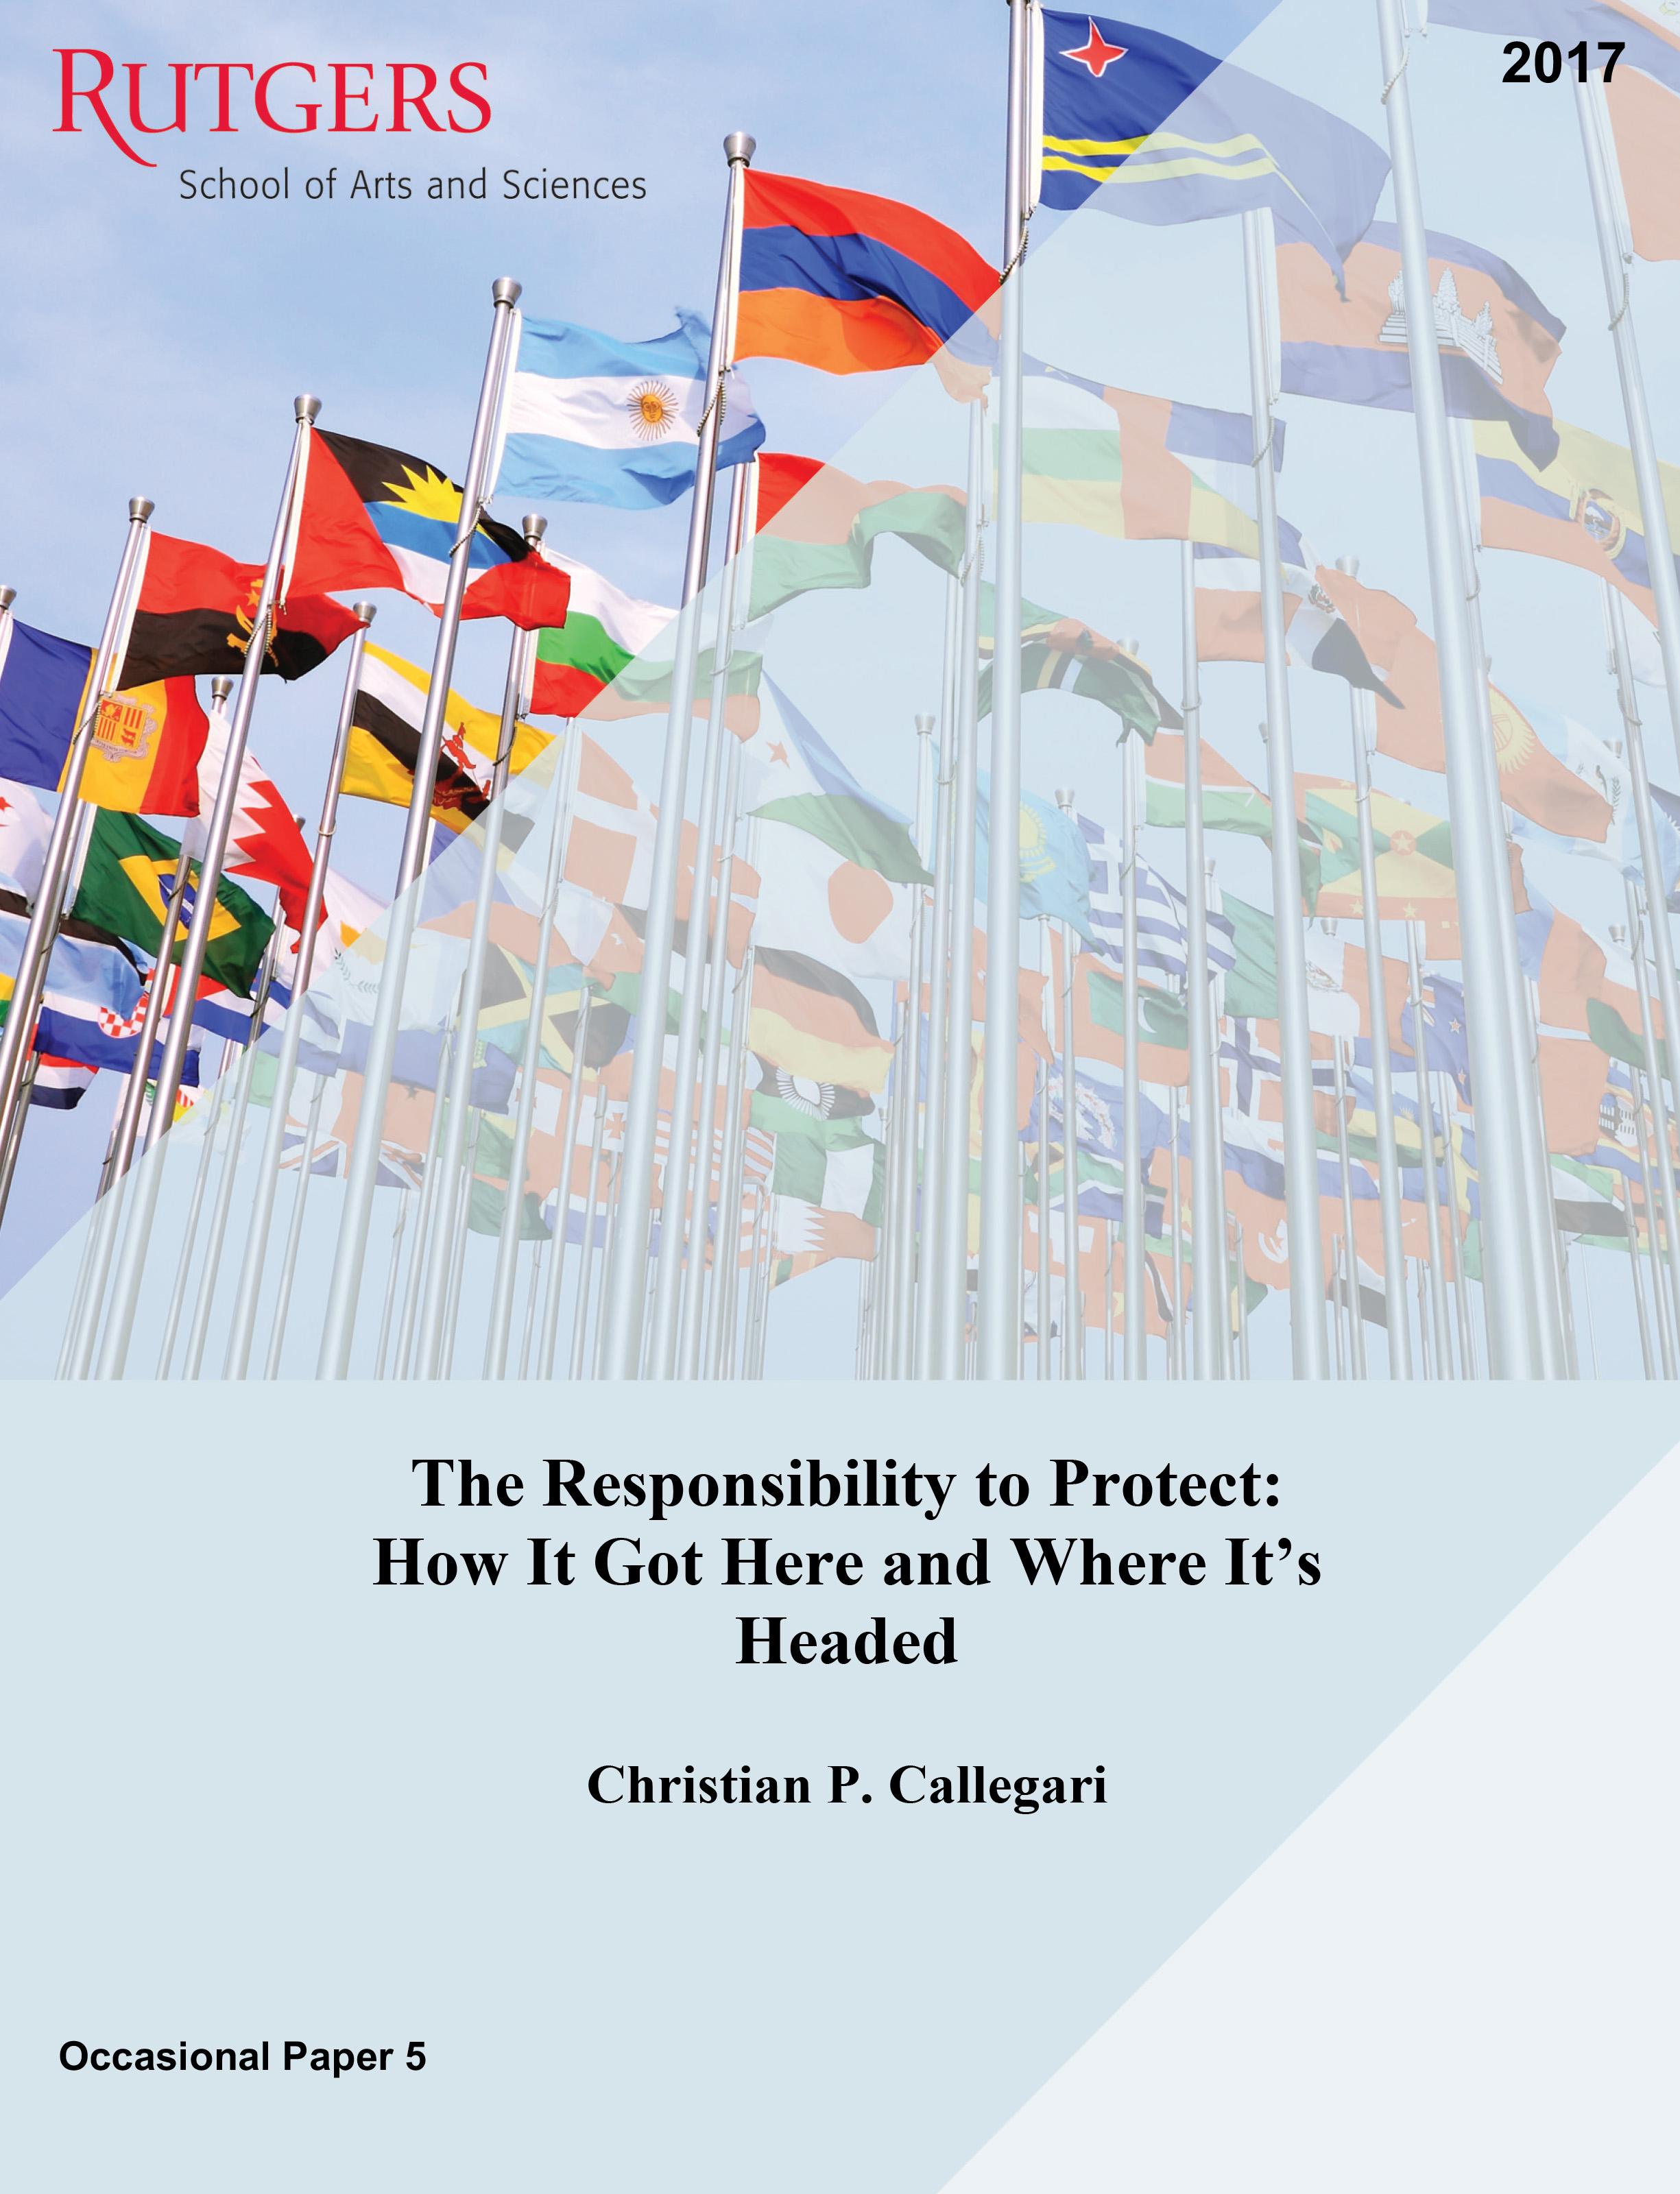 Occasional Paper 5 Christian P. Callegari